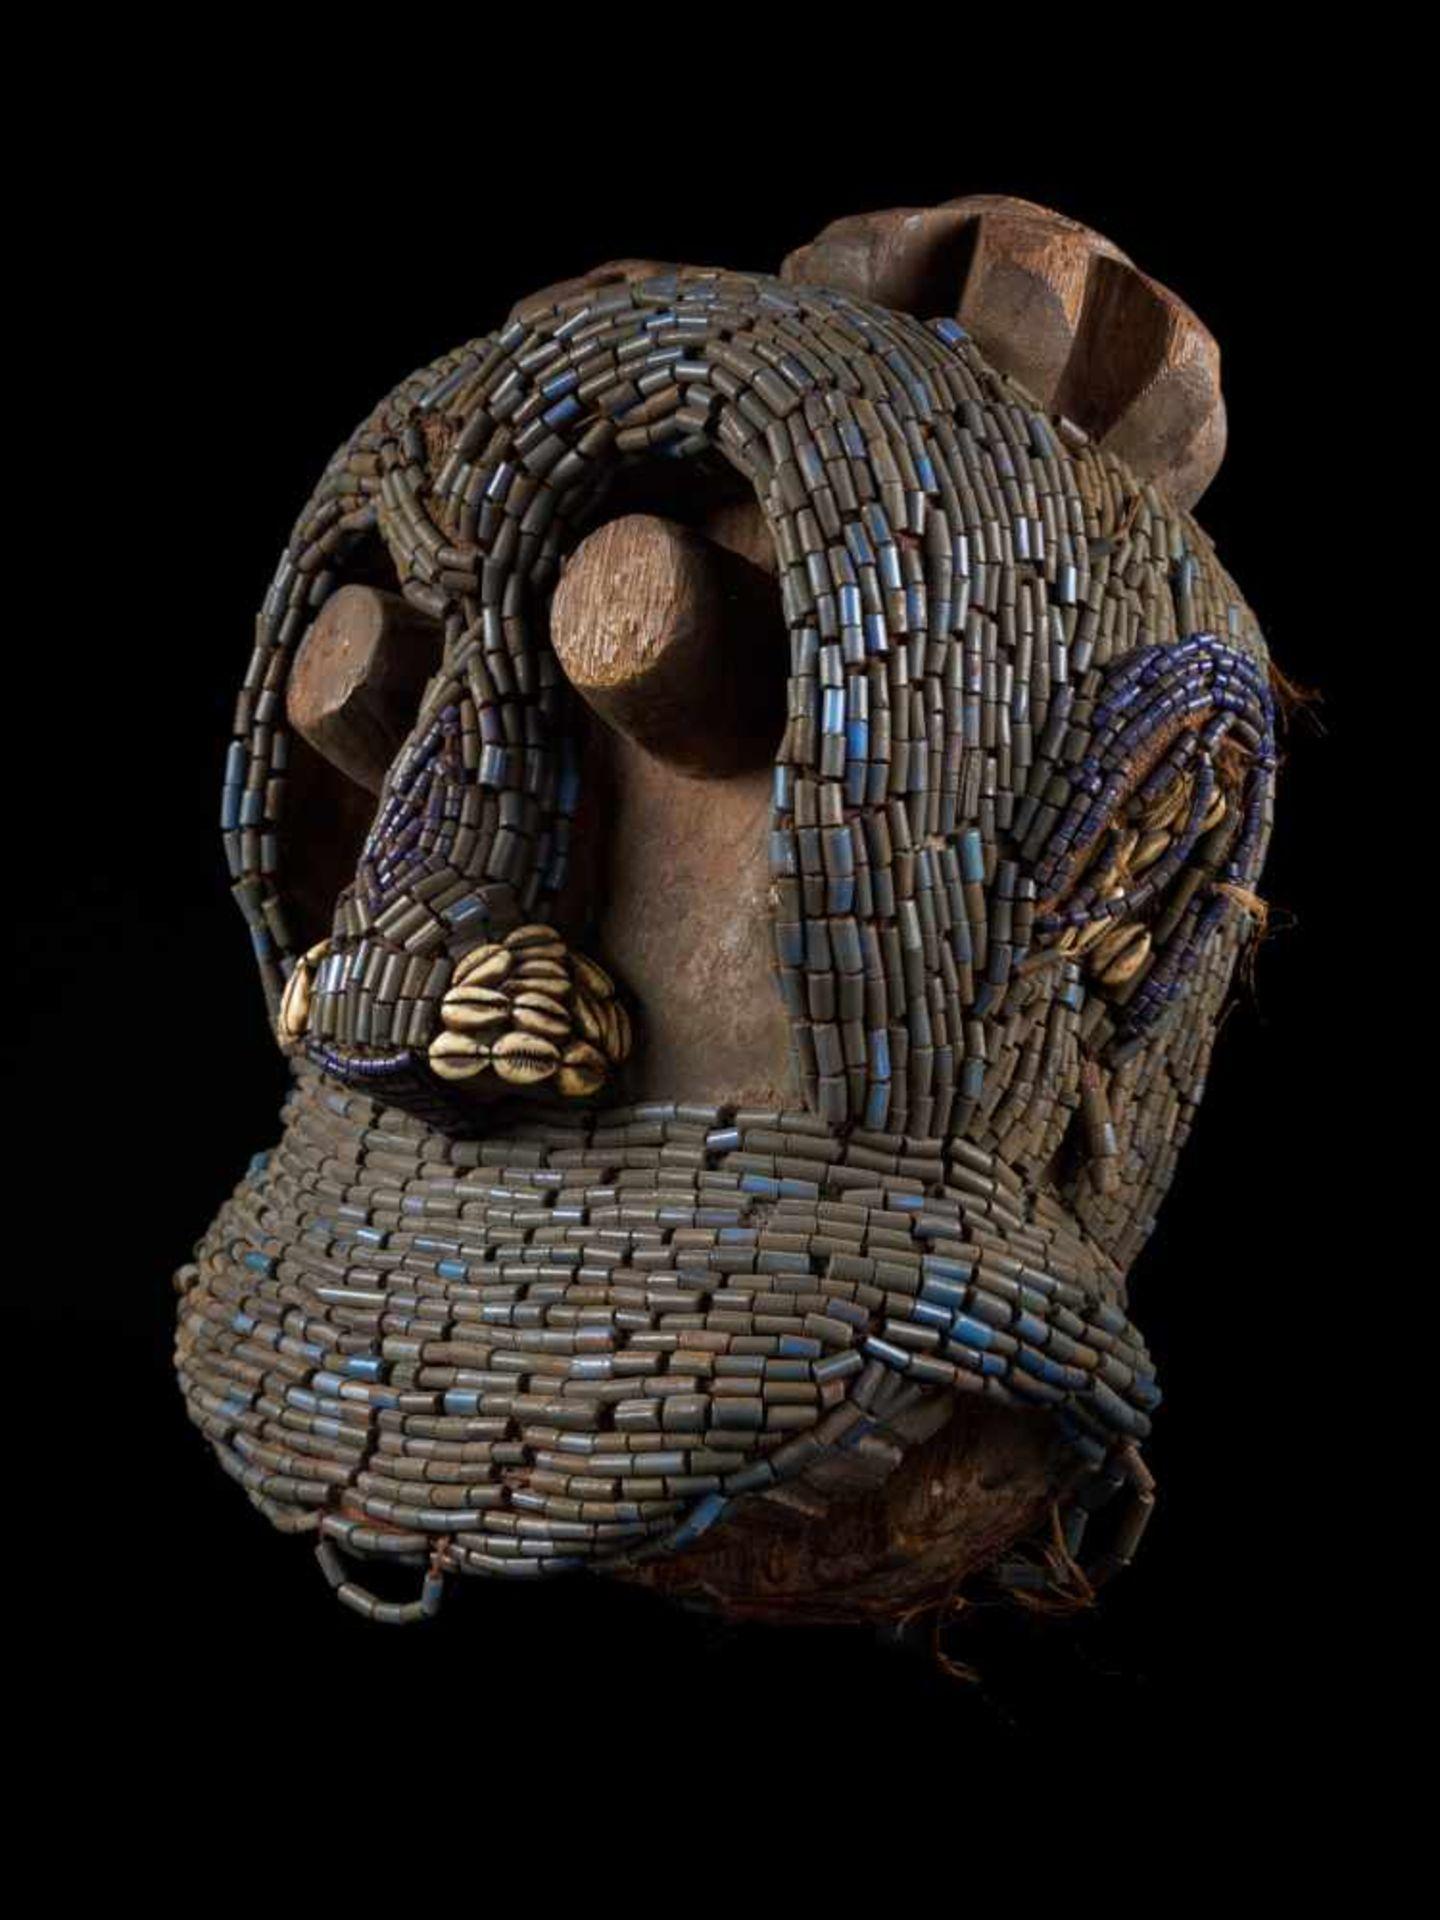 Beaded Gorilla Mask With Wooden Headdress - Tribal ArtA beautiful gorilla mask fashioned from wood